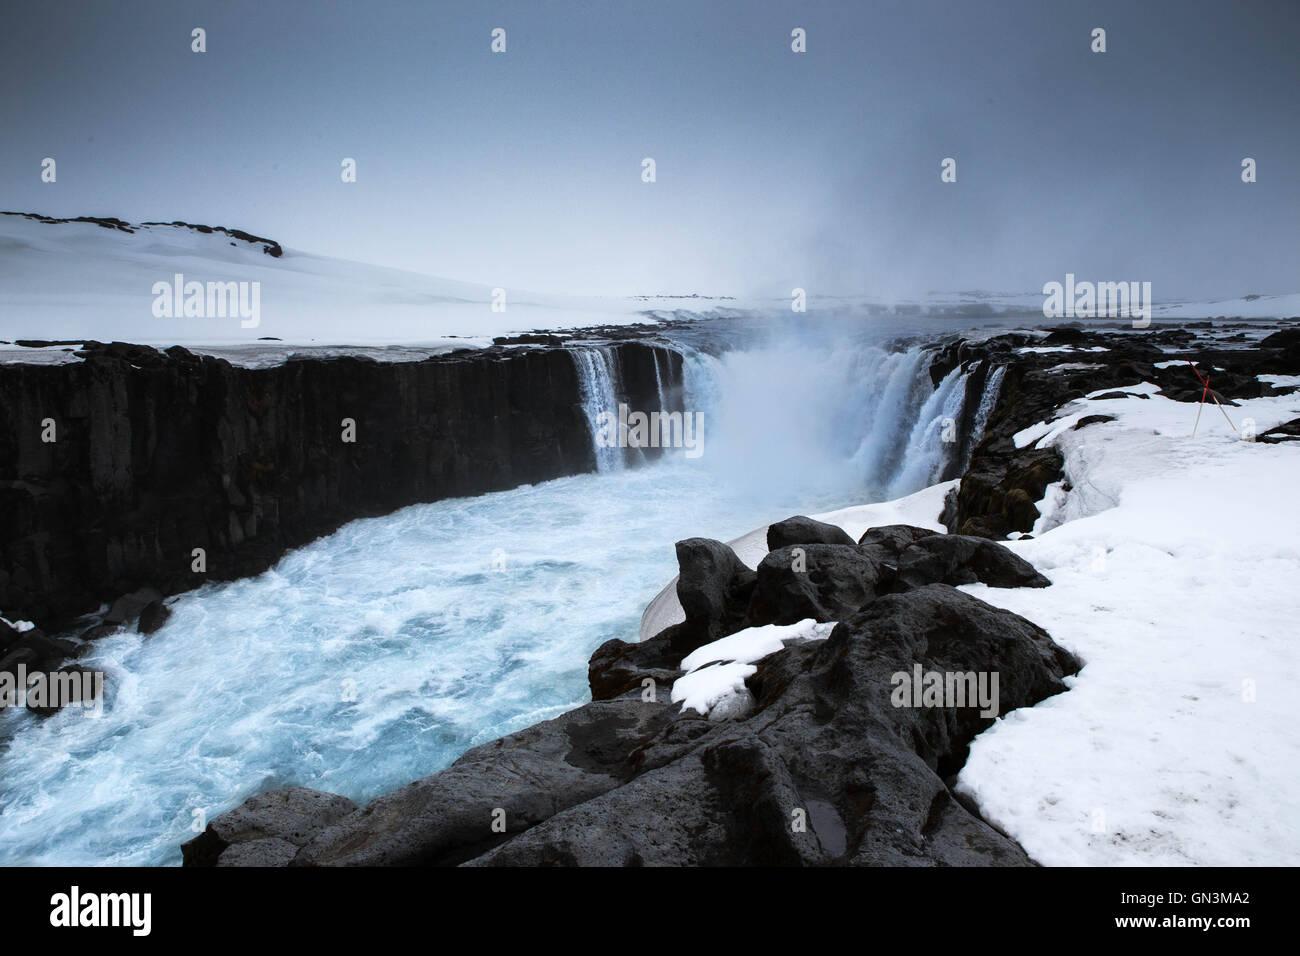 Godafoss, Waterfall, Iceland Landscapes - Stock Image